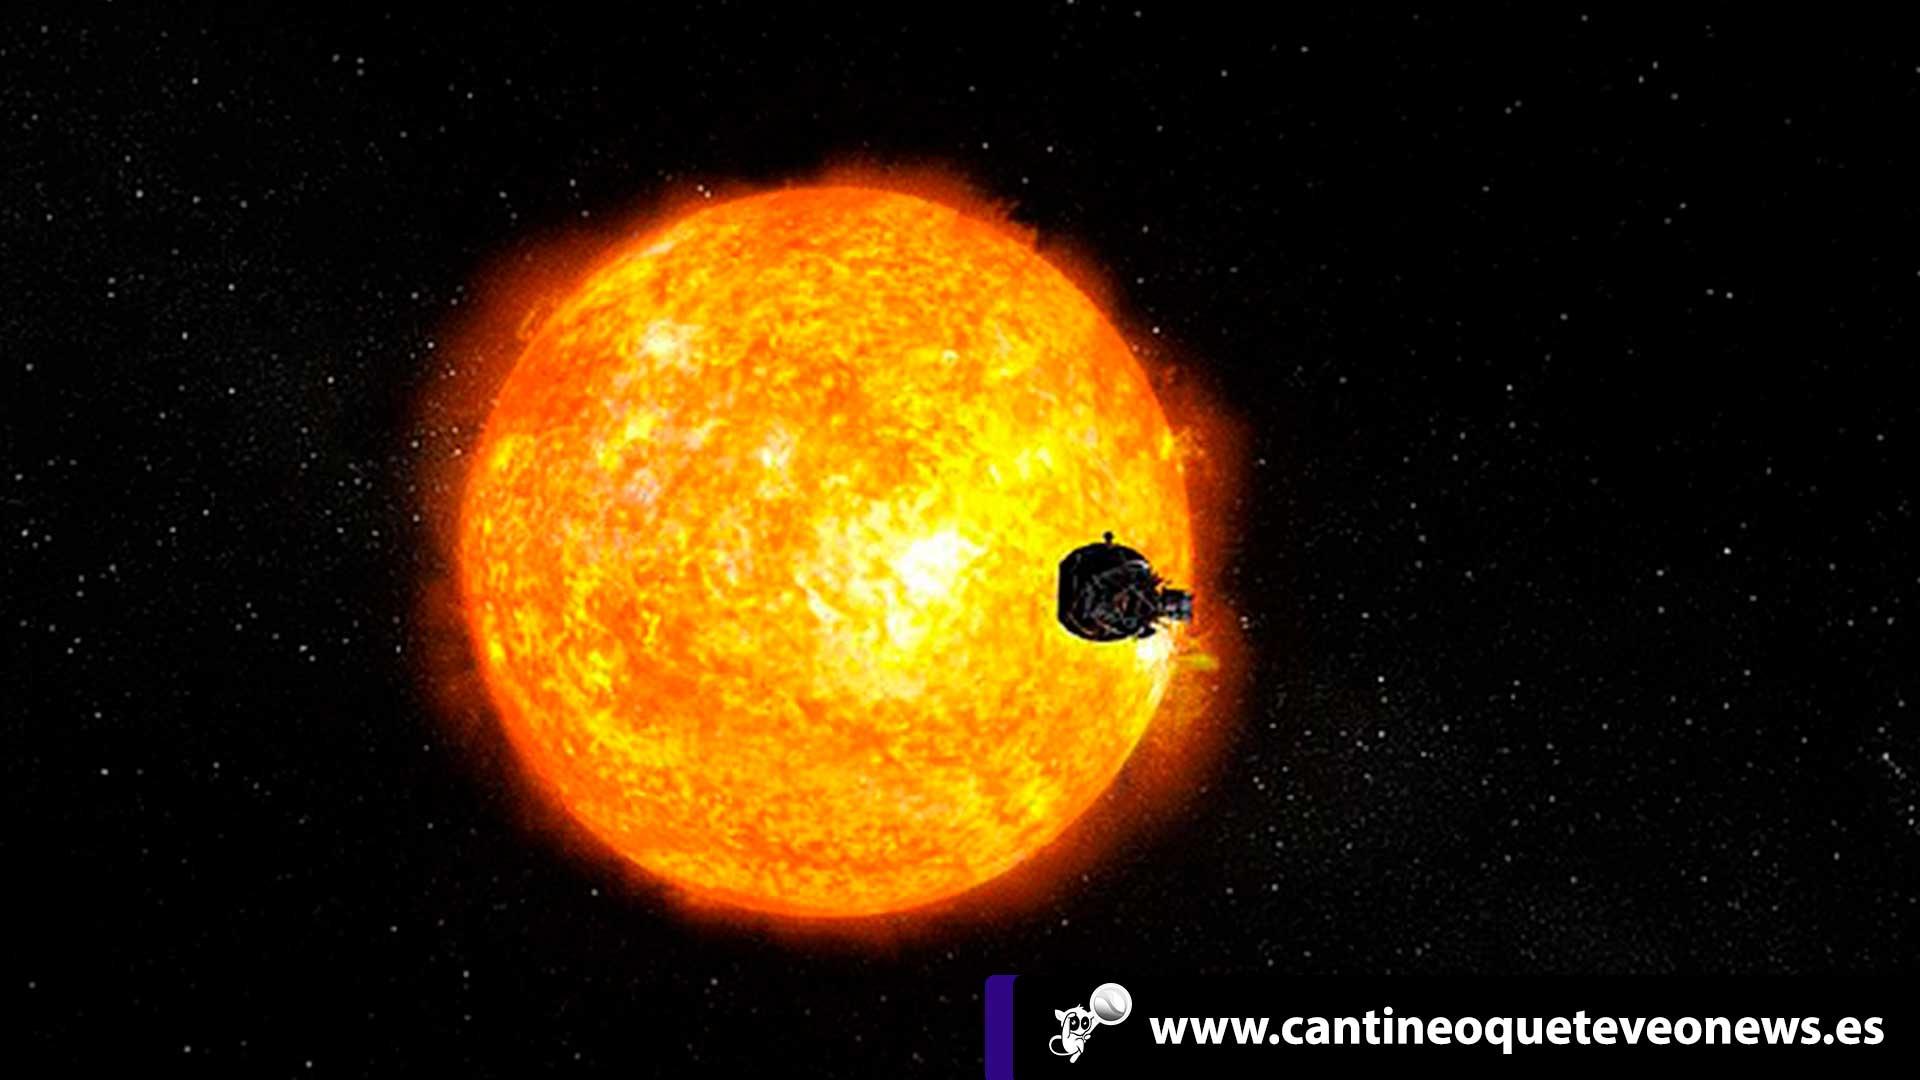 Cantineoqueteveo News - nave espacial